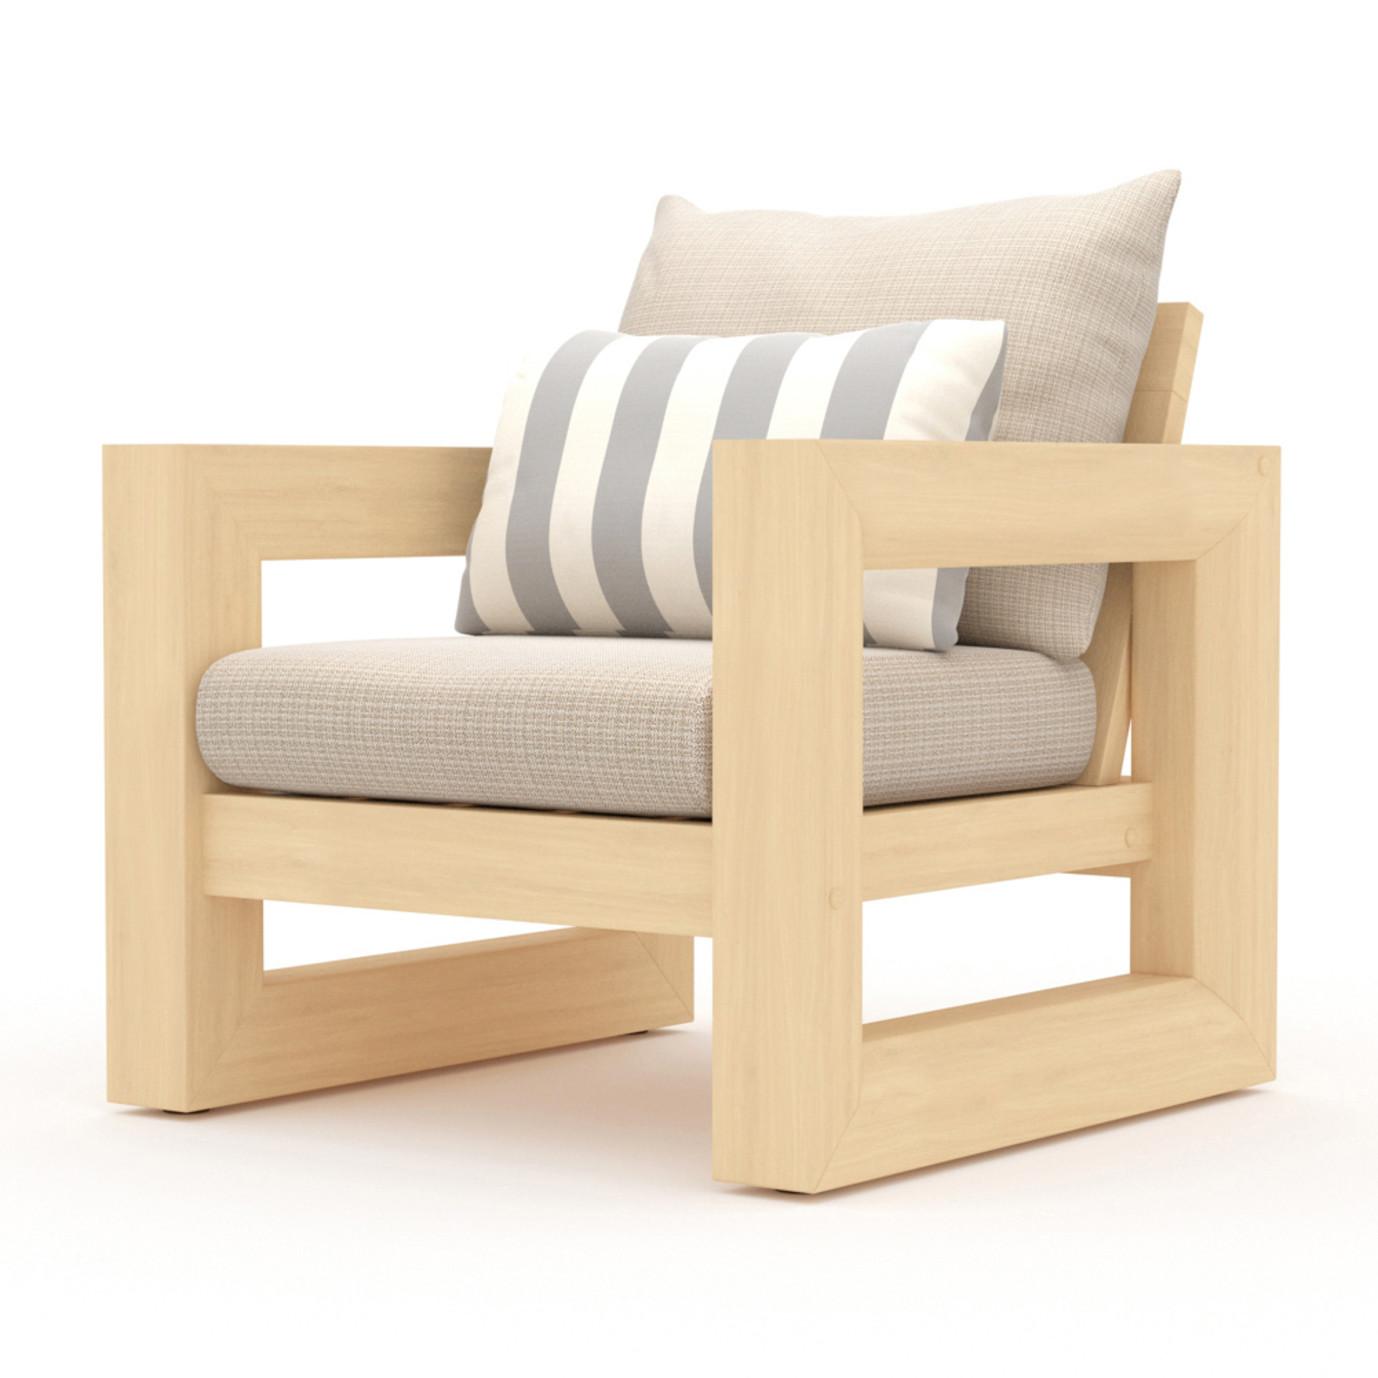 Benson 8pc Sofa & Club Chair Set - Slate Gray